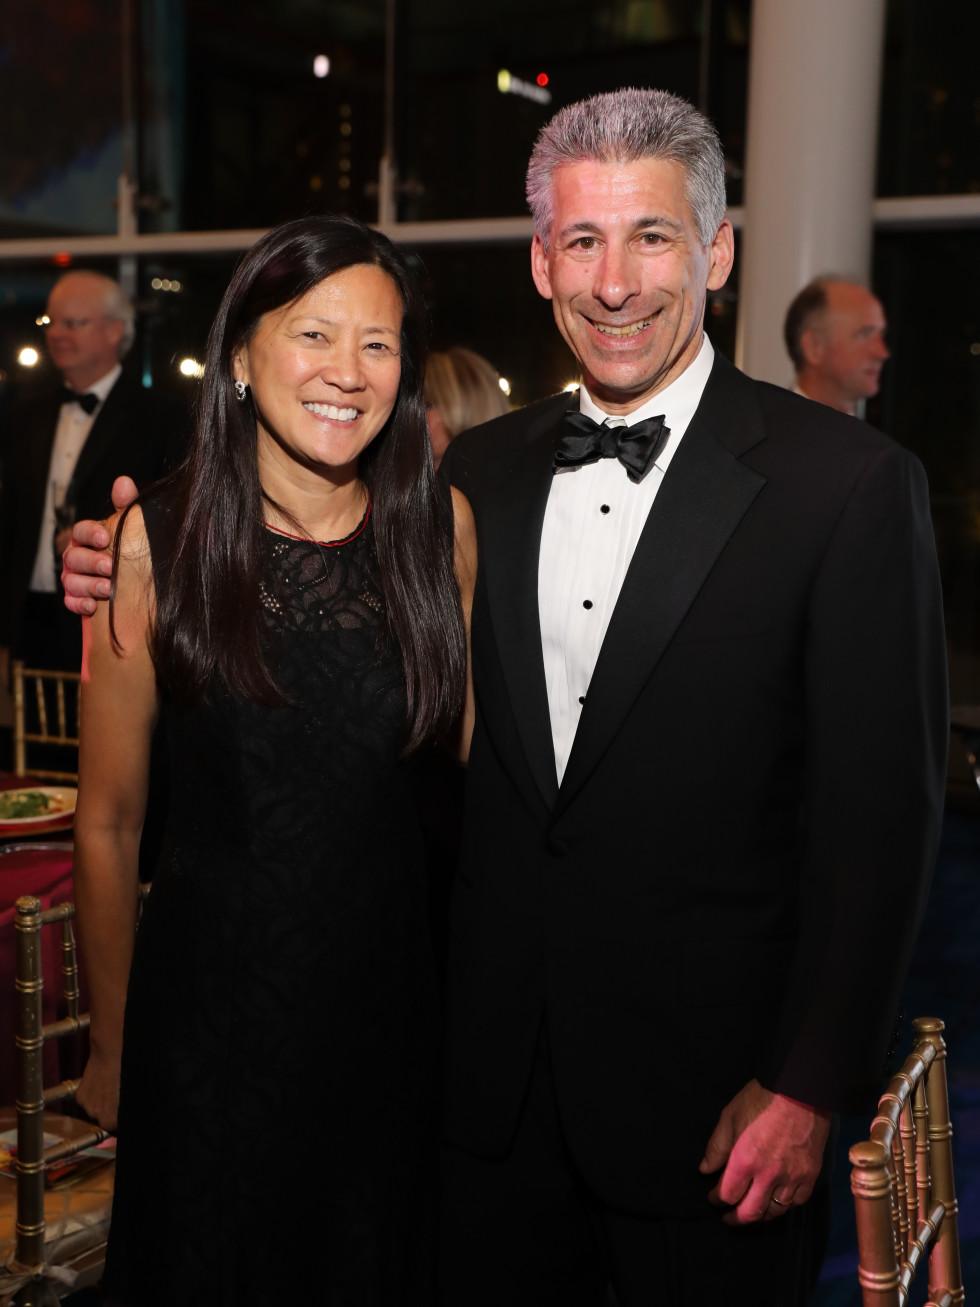 Claire Liu and Joe Greenberg at Houston Grand Opera opening night 2017